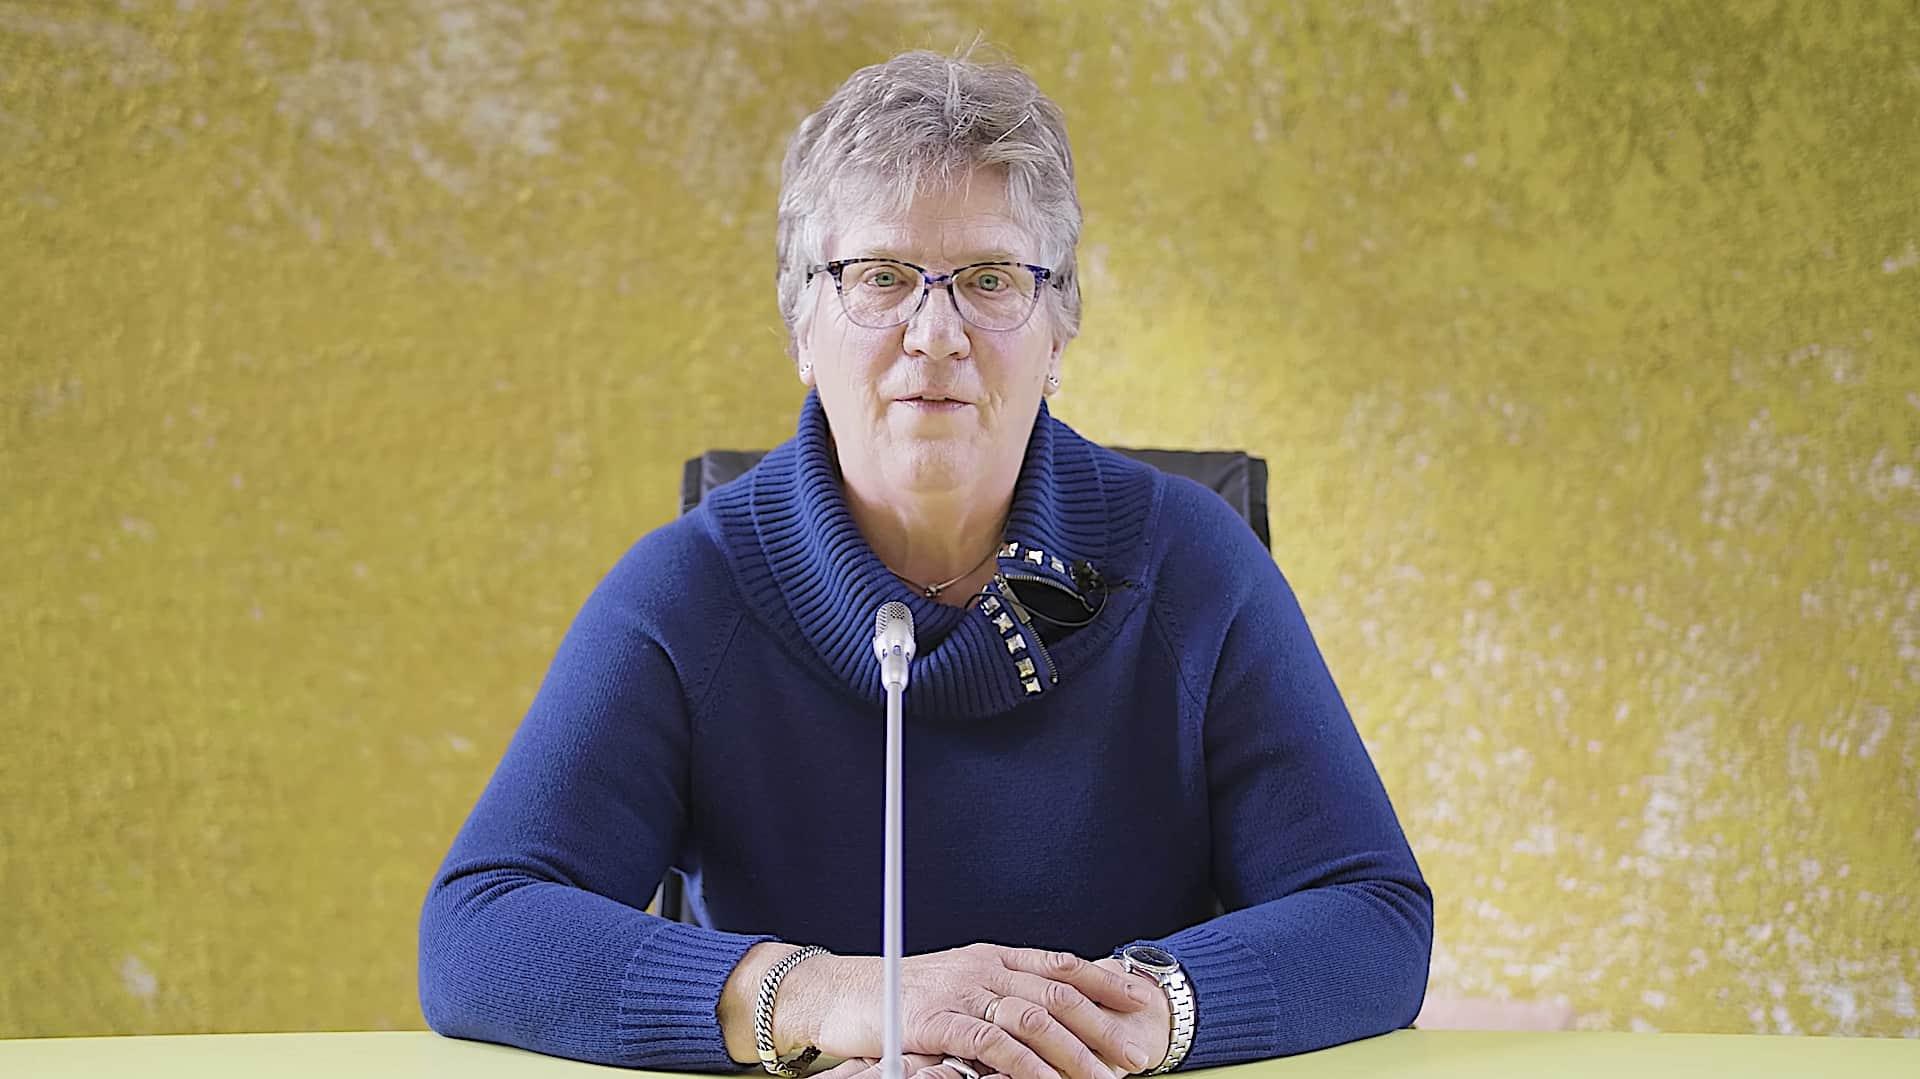 J. (Jacqueline) Willemsen-Post